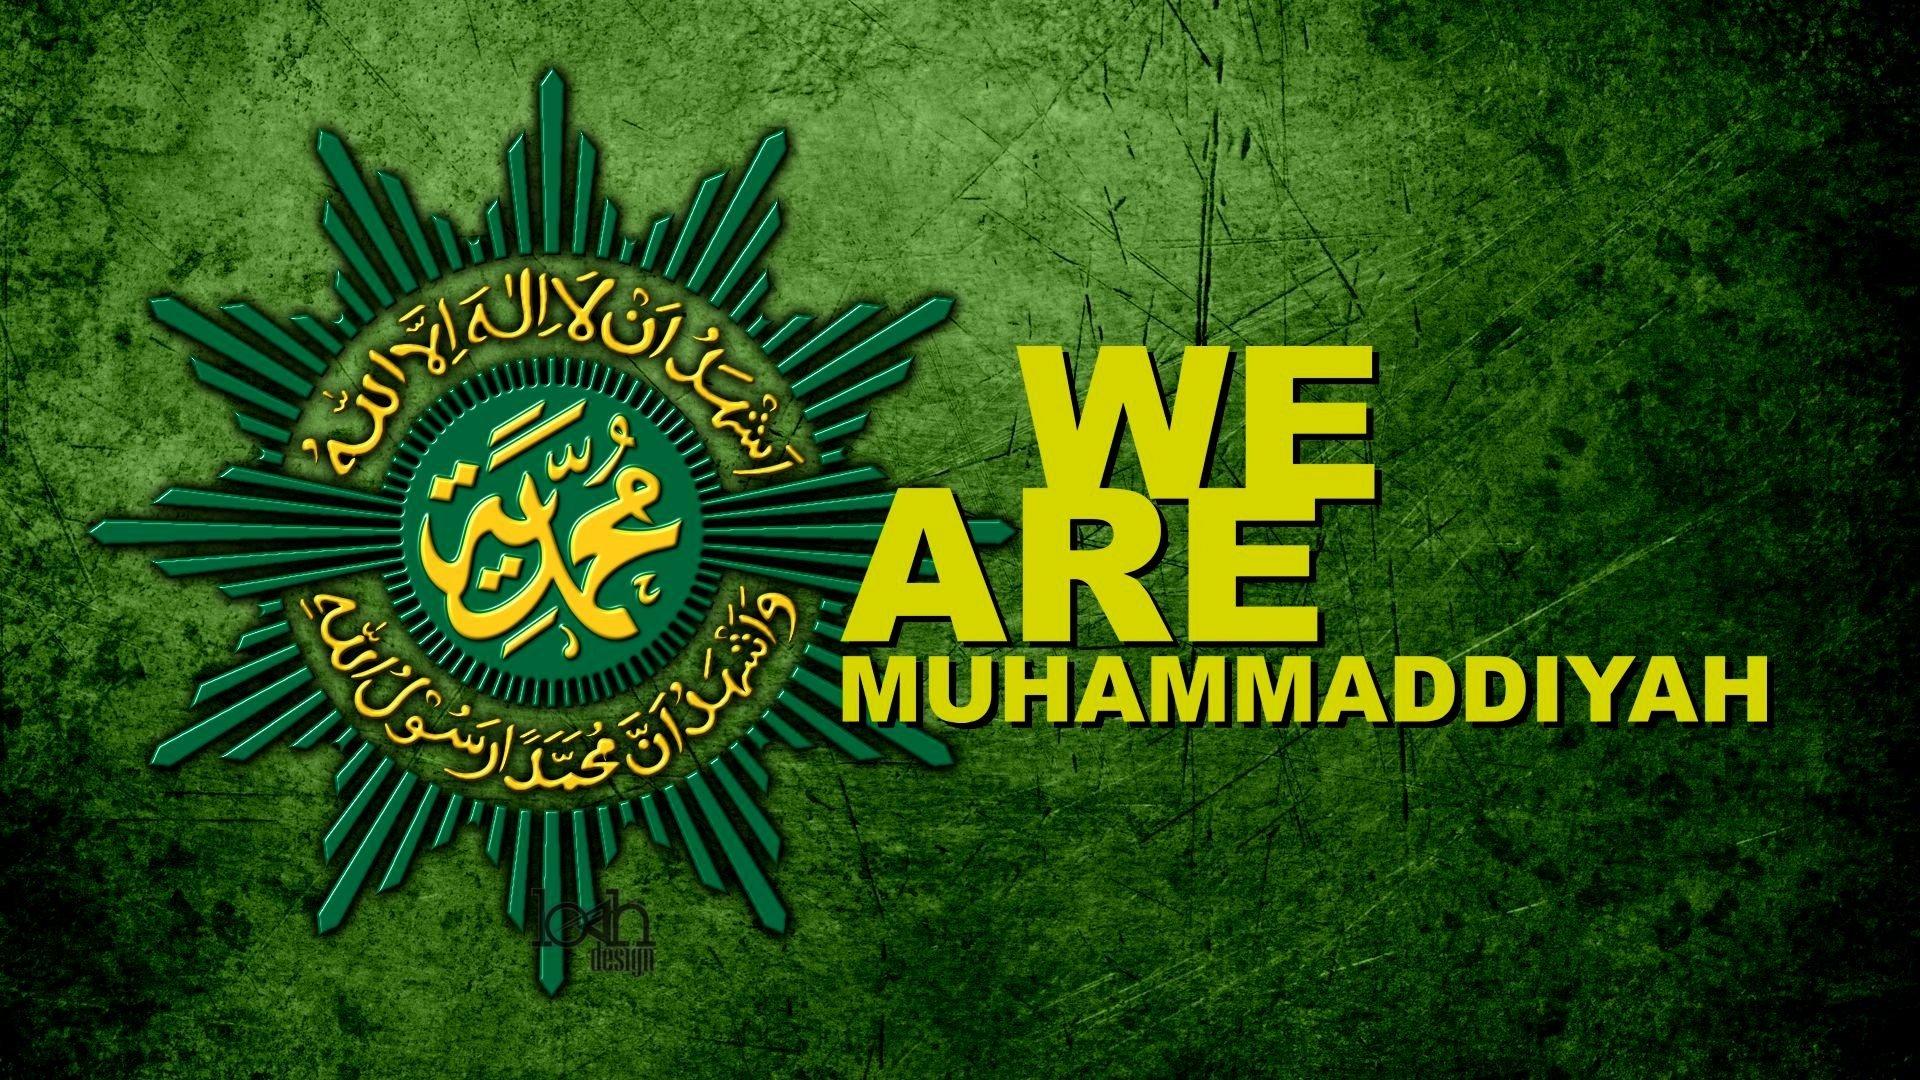 Muhammadiyah logo HD Wallpaper | Background Image ...